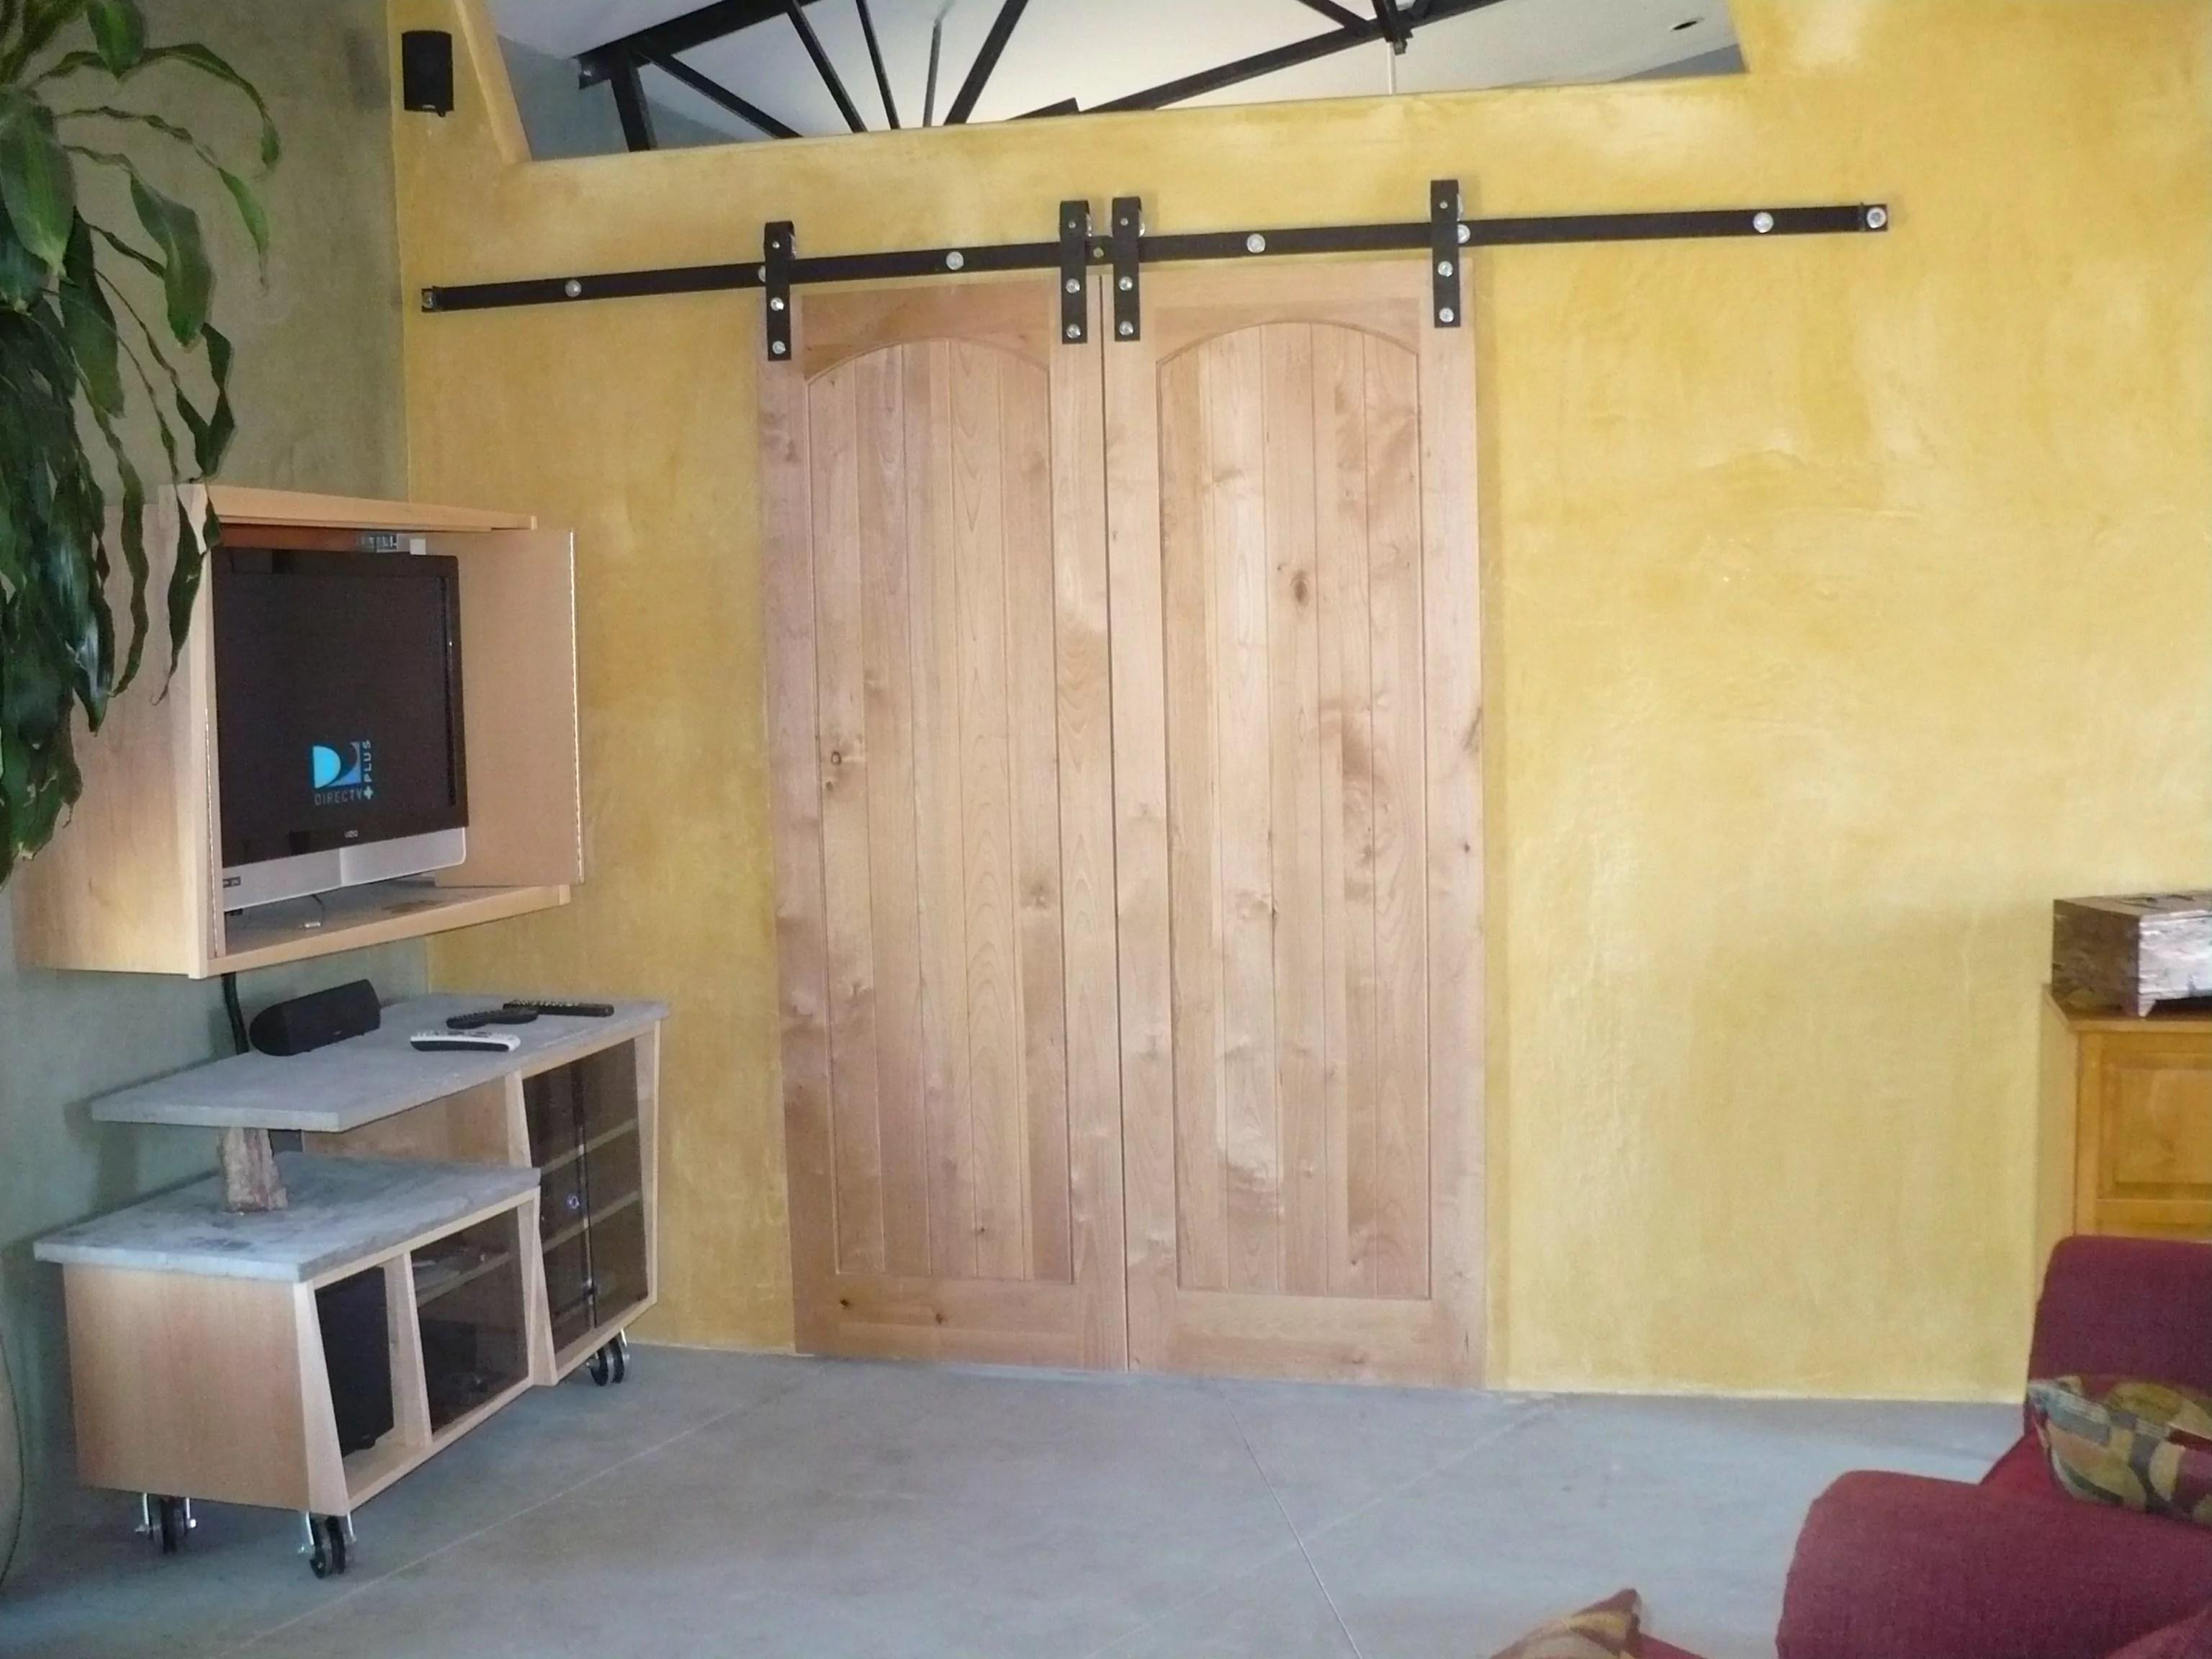 Wood Storage Building Kits